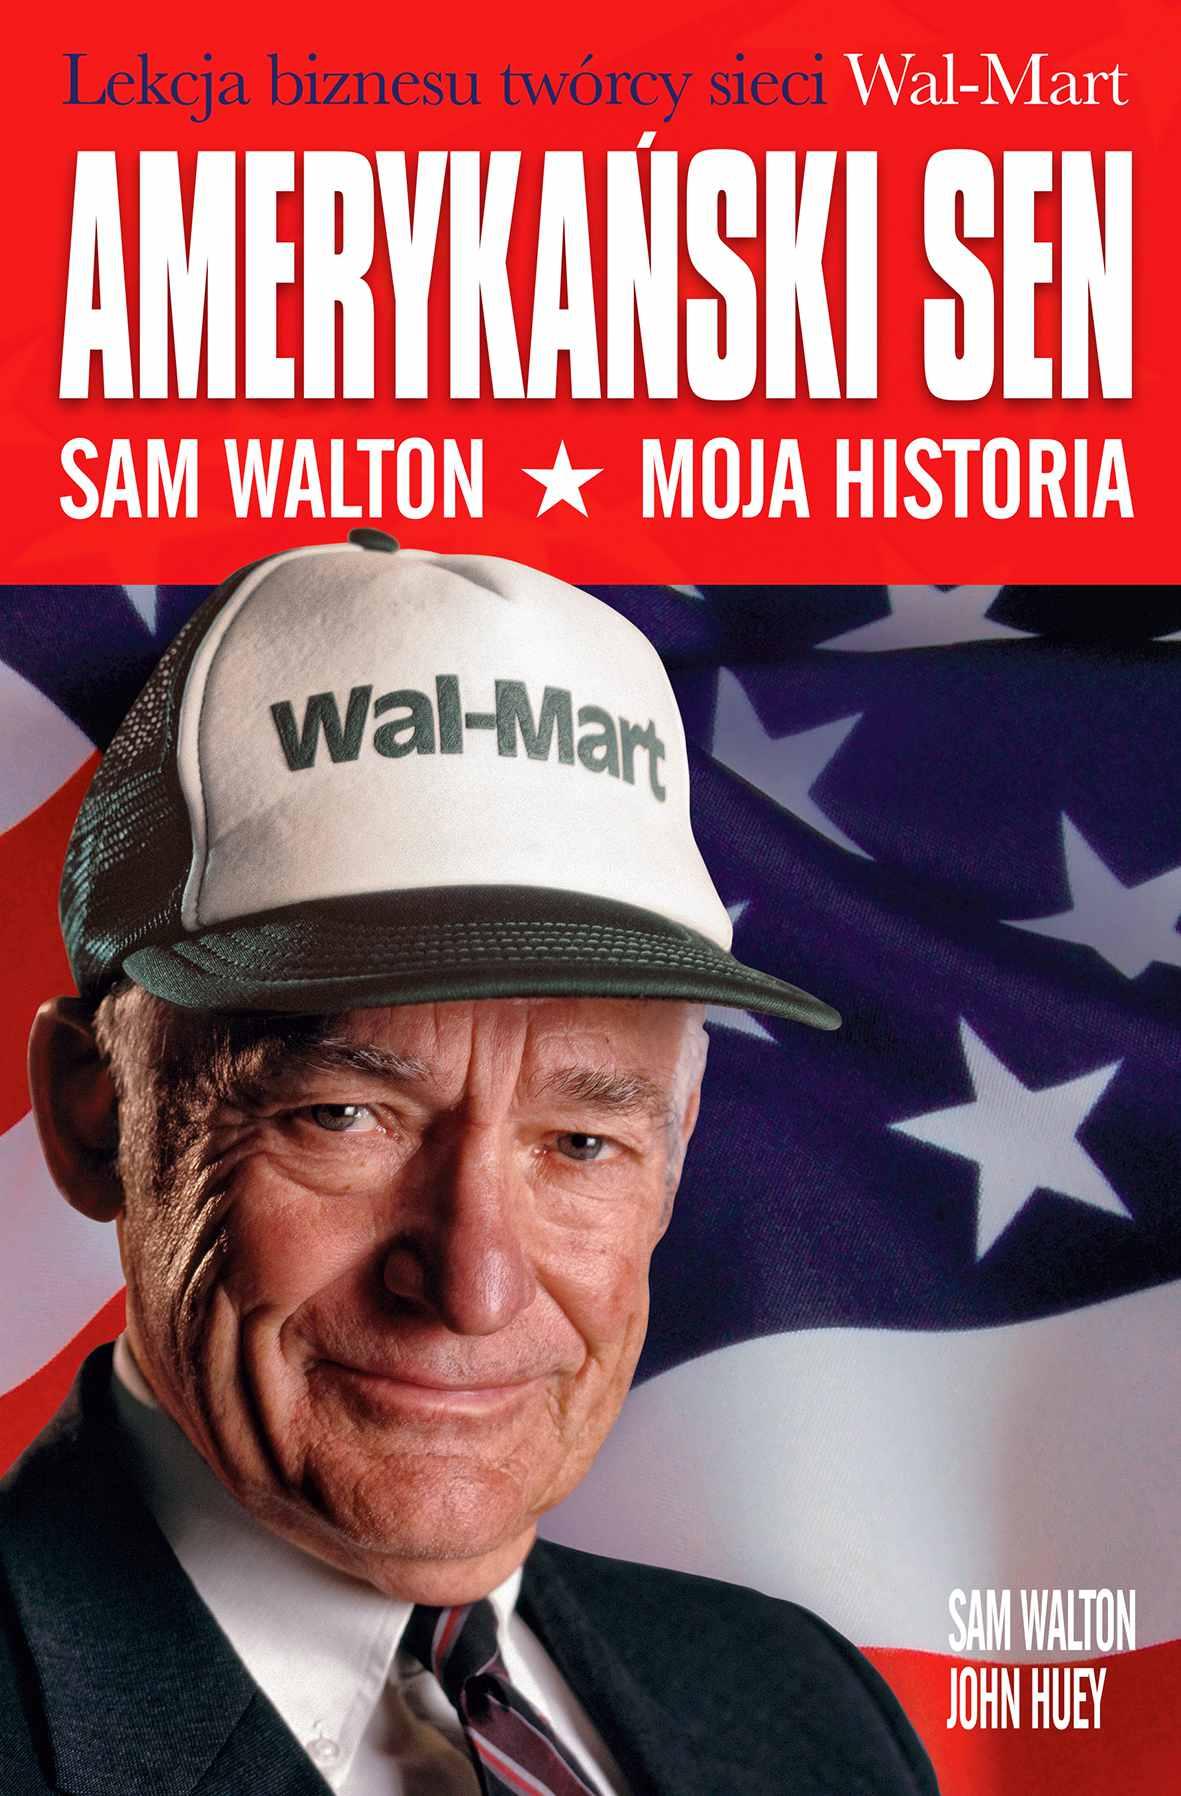 Amerykański sen. Sam Walton. Moja historia - Ebook (Książka na Kindle) do pobrania w formacie MOBI